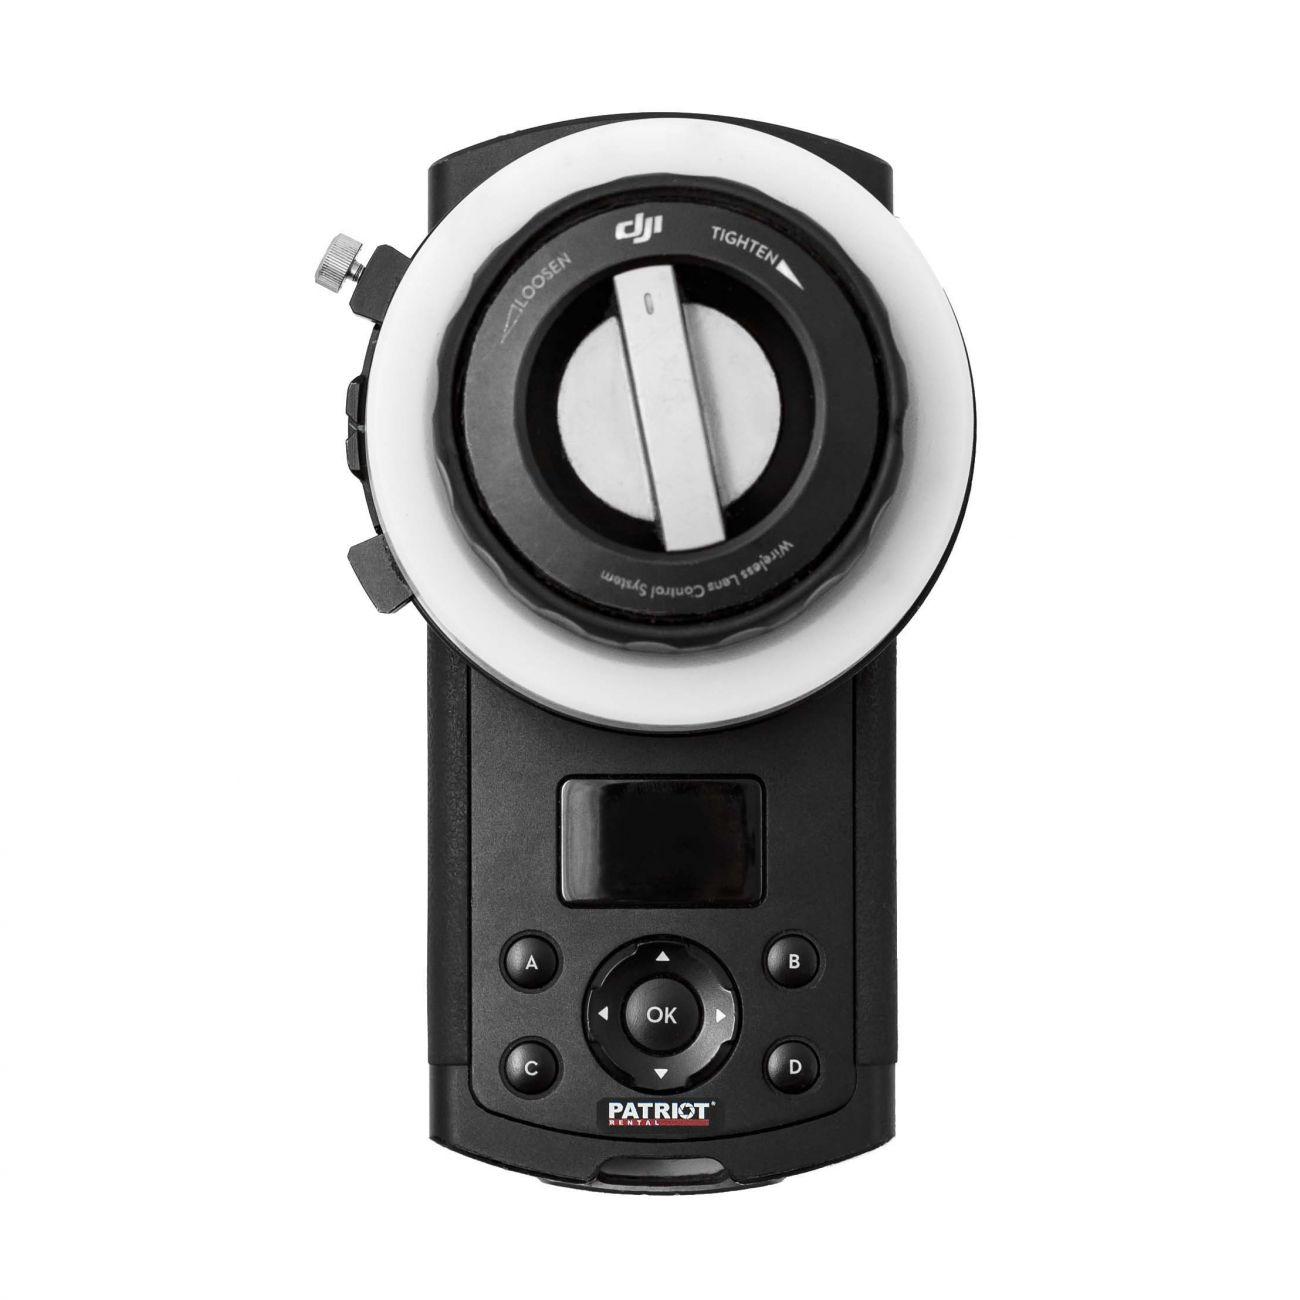 Wireless Focus Control DJI 1 motor